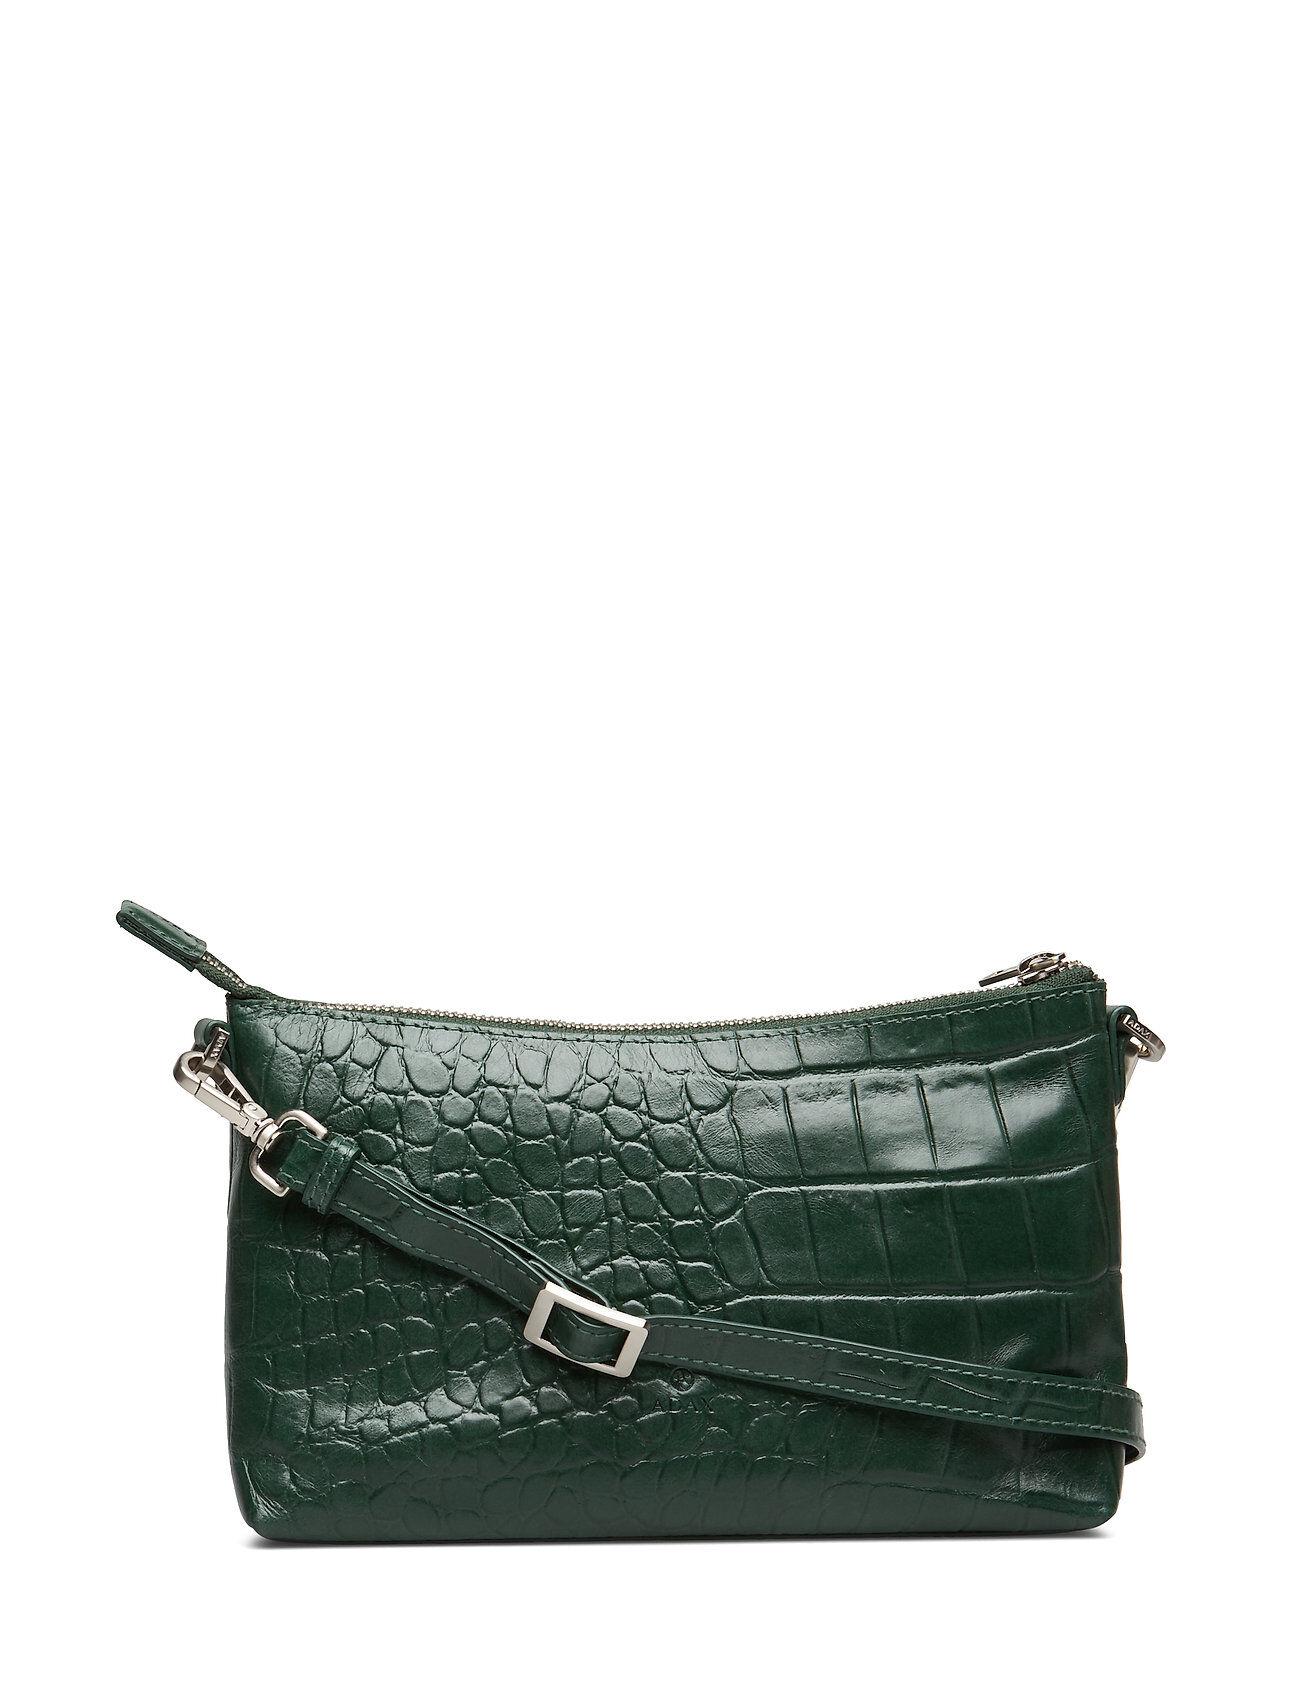 Adax Teramo Shoulder Bag Smilla Bags Small Shoulder Bags - Crossbody Bags Vihreä Adax